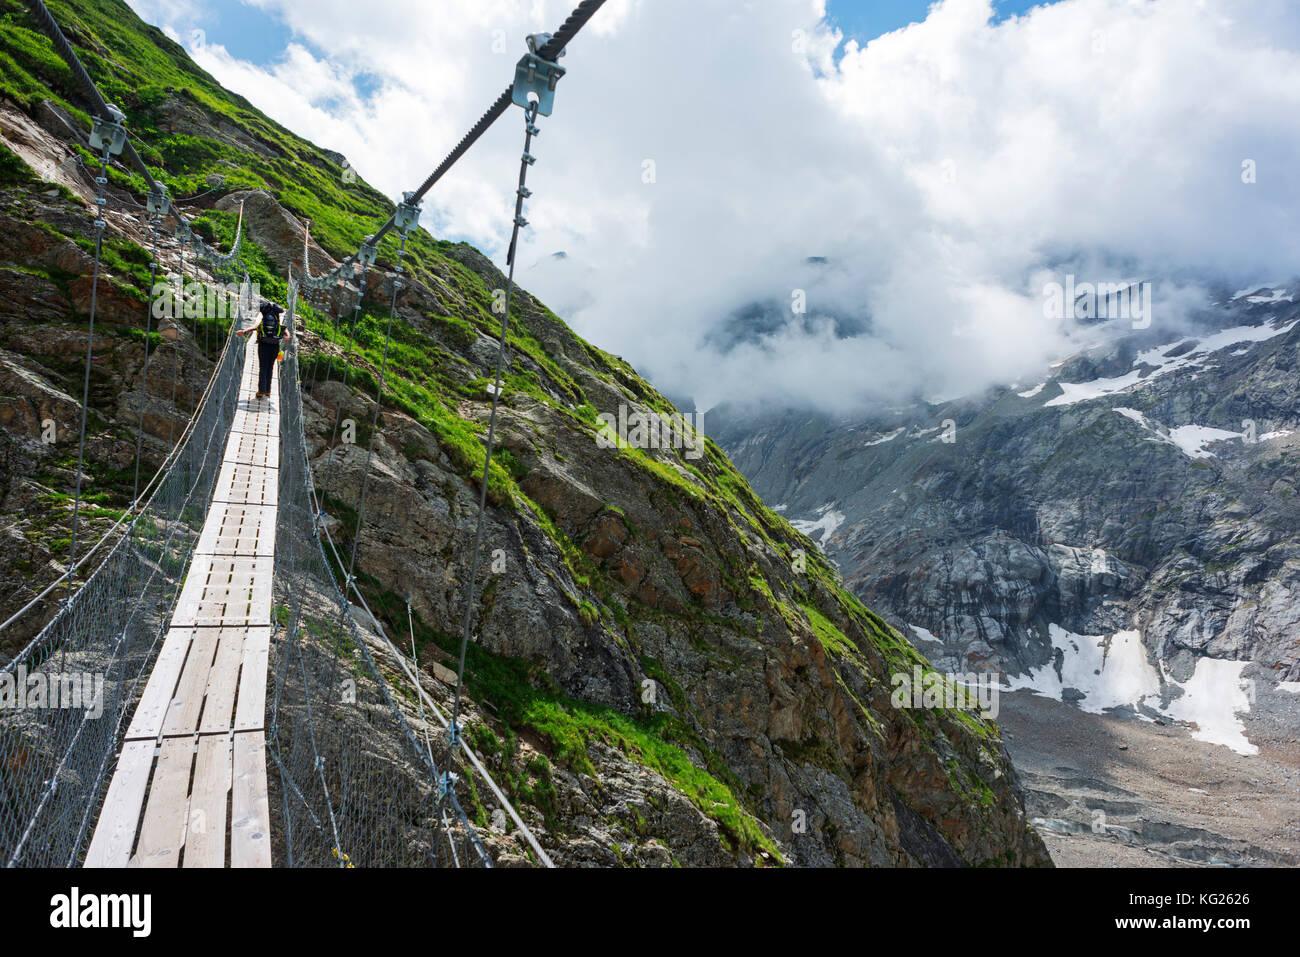 Hiker on a suspension bridge, Chamonix, Rhone Alpes, Haute Savoie, France, Europe Stock Photo